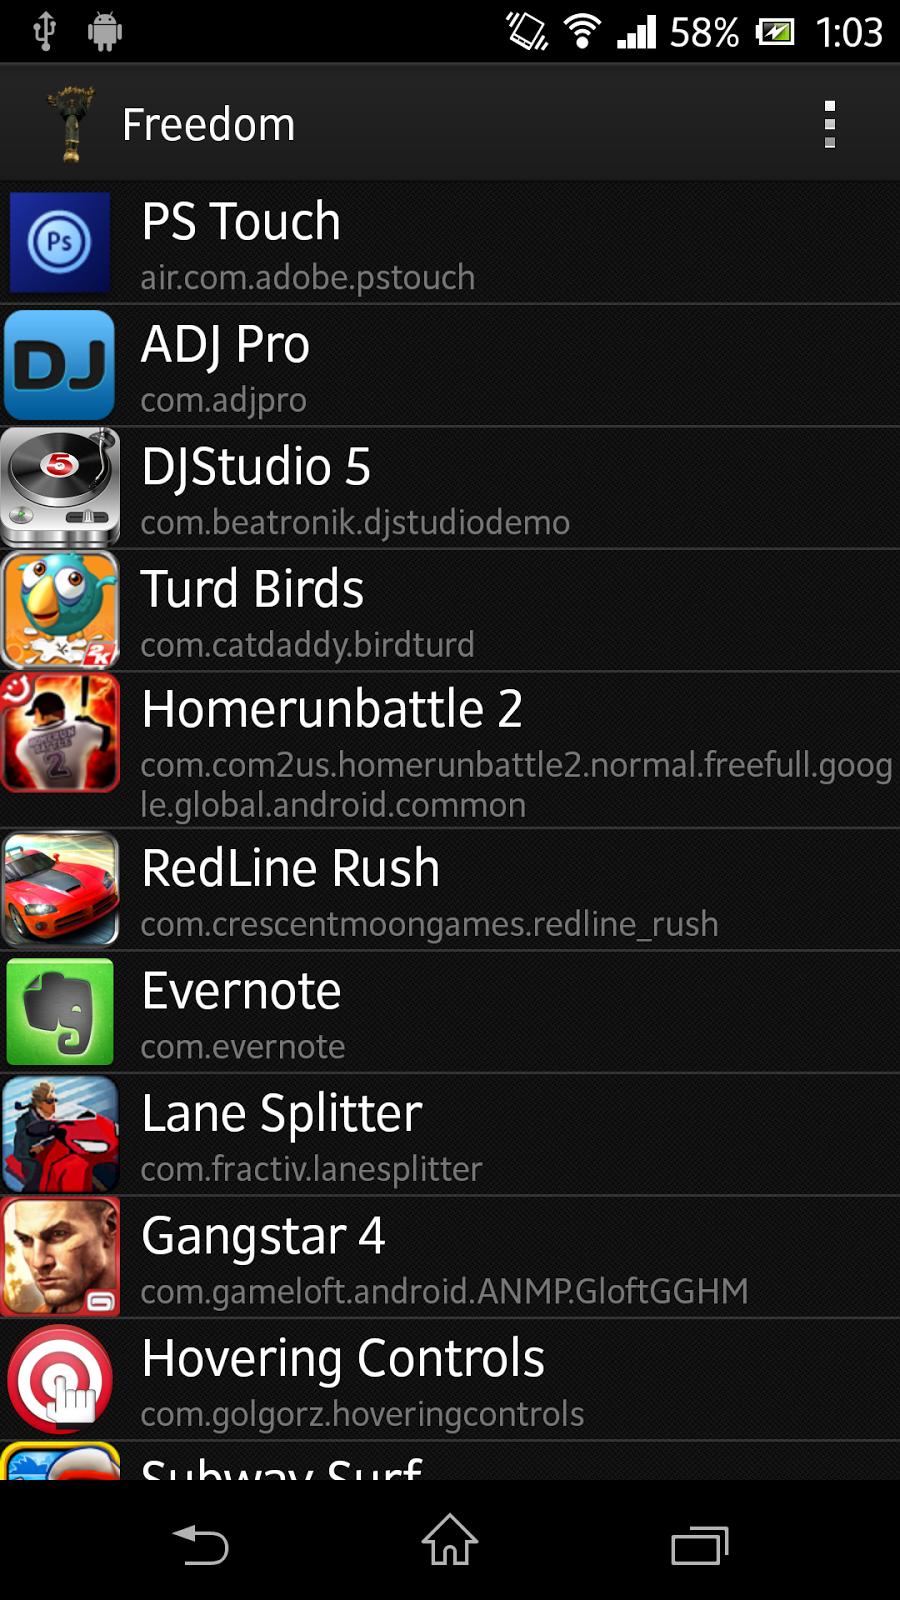 download game killer apk 2014